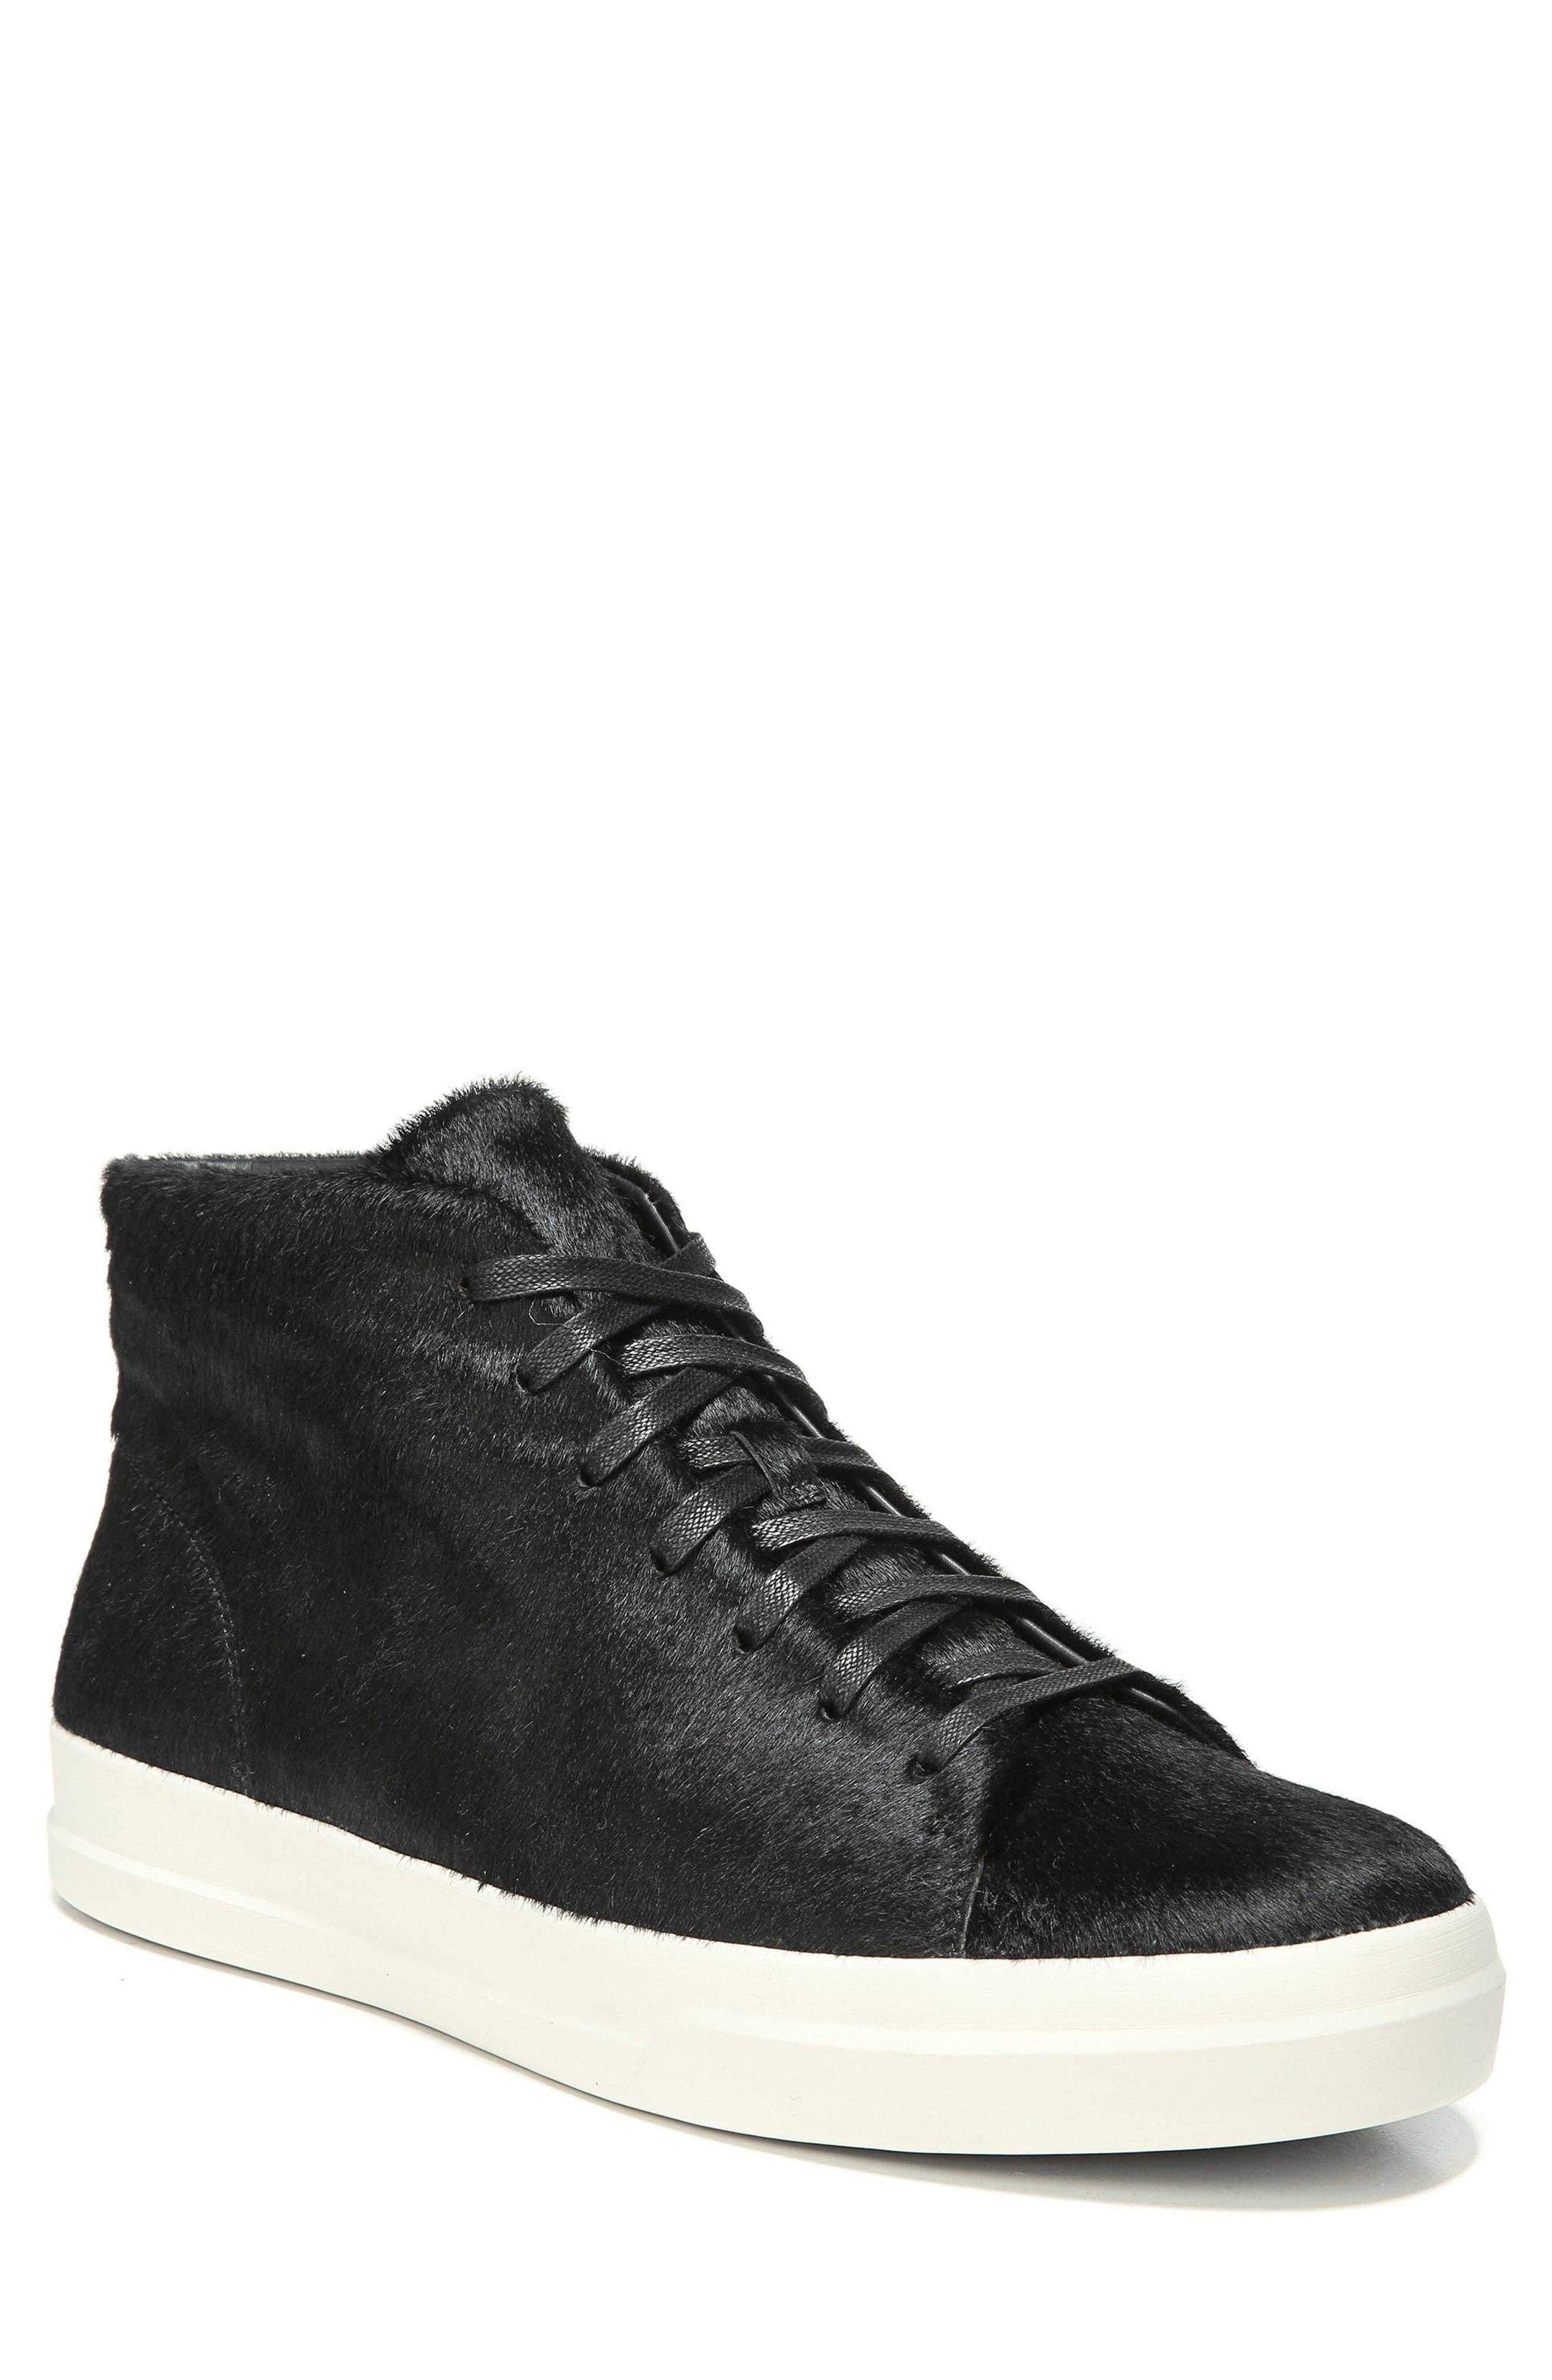 Cullen Sneaker,                             Main thumbnail 1, color,                             002